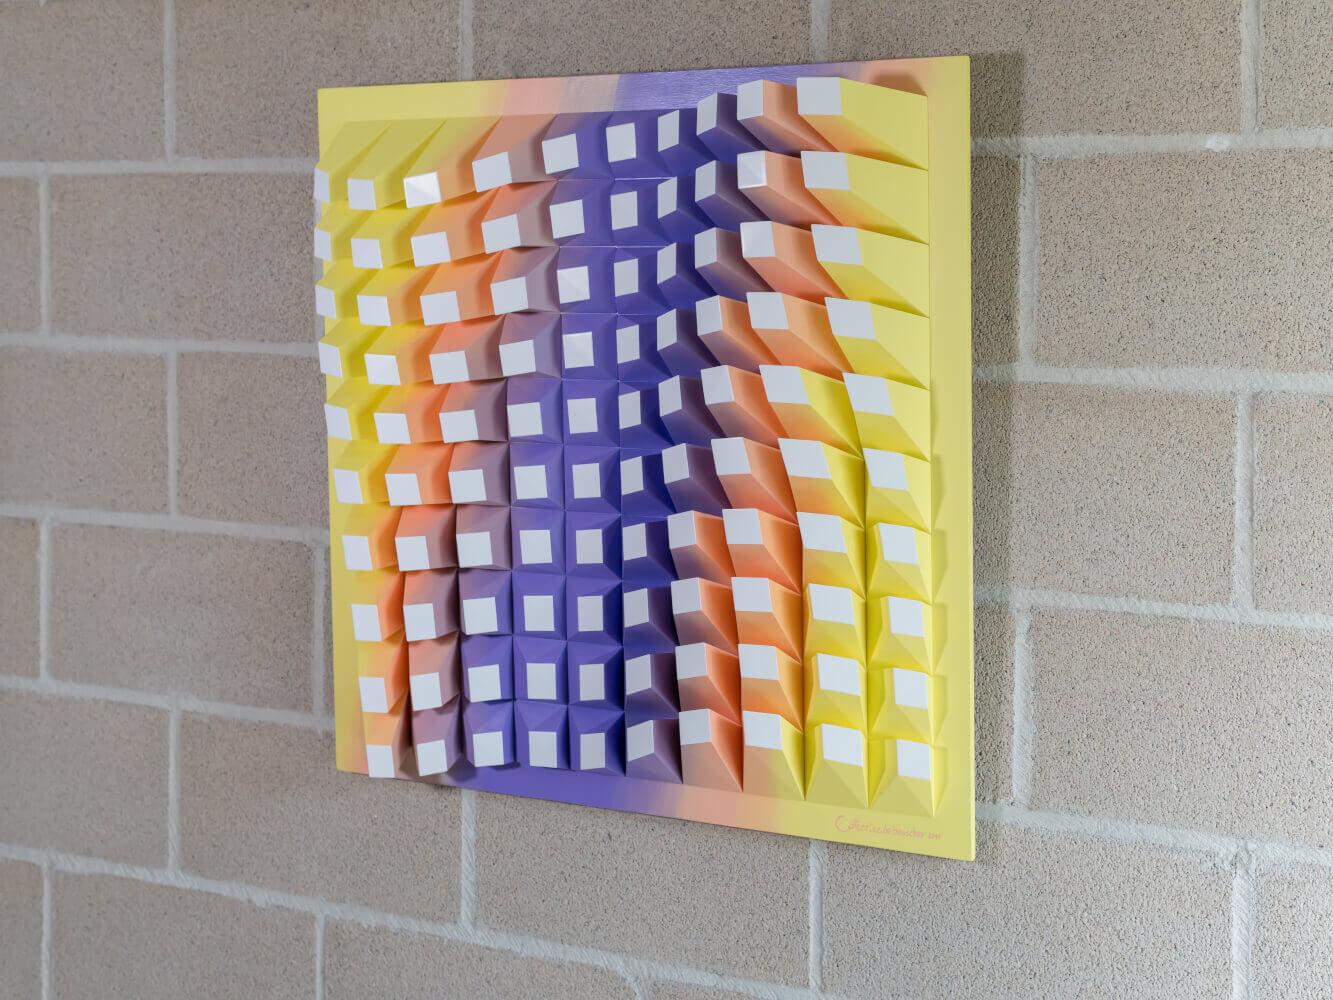 'Matrix of Life 100' Wall Sculpture 72x72x8,5 cm/ 28.3x28.3x3.3 inch.